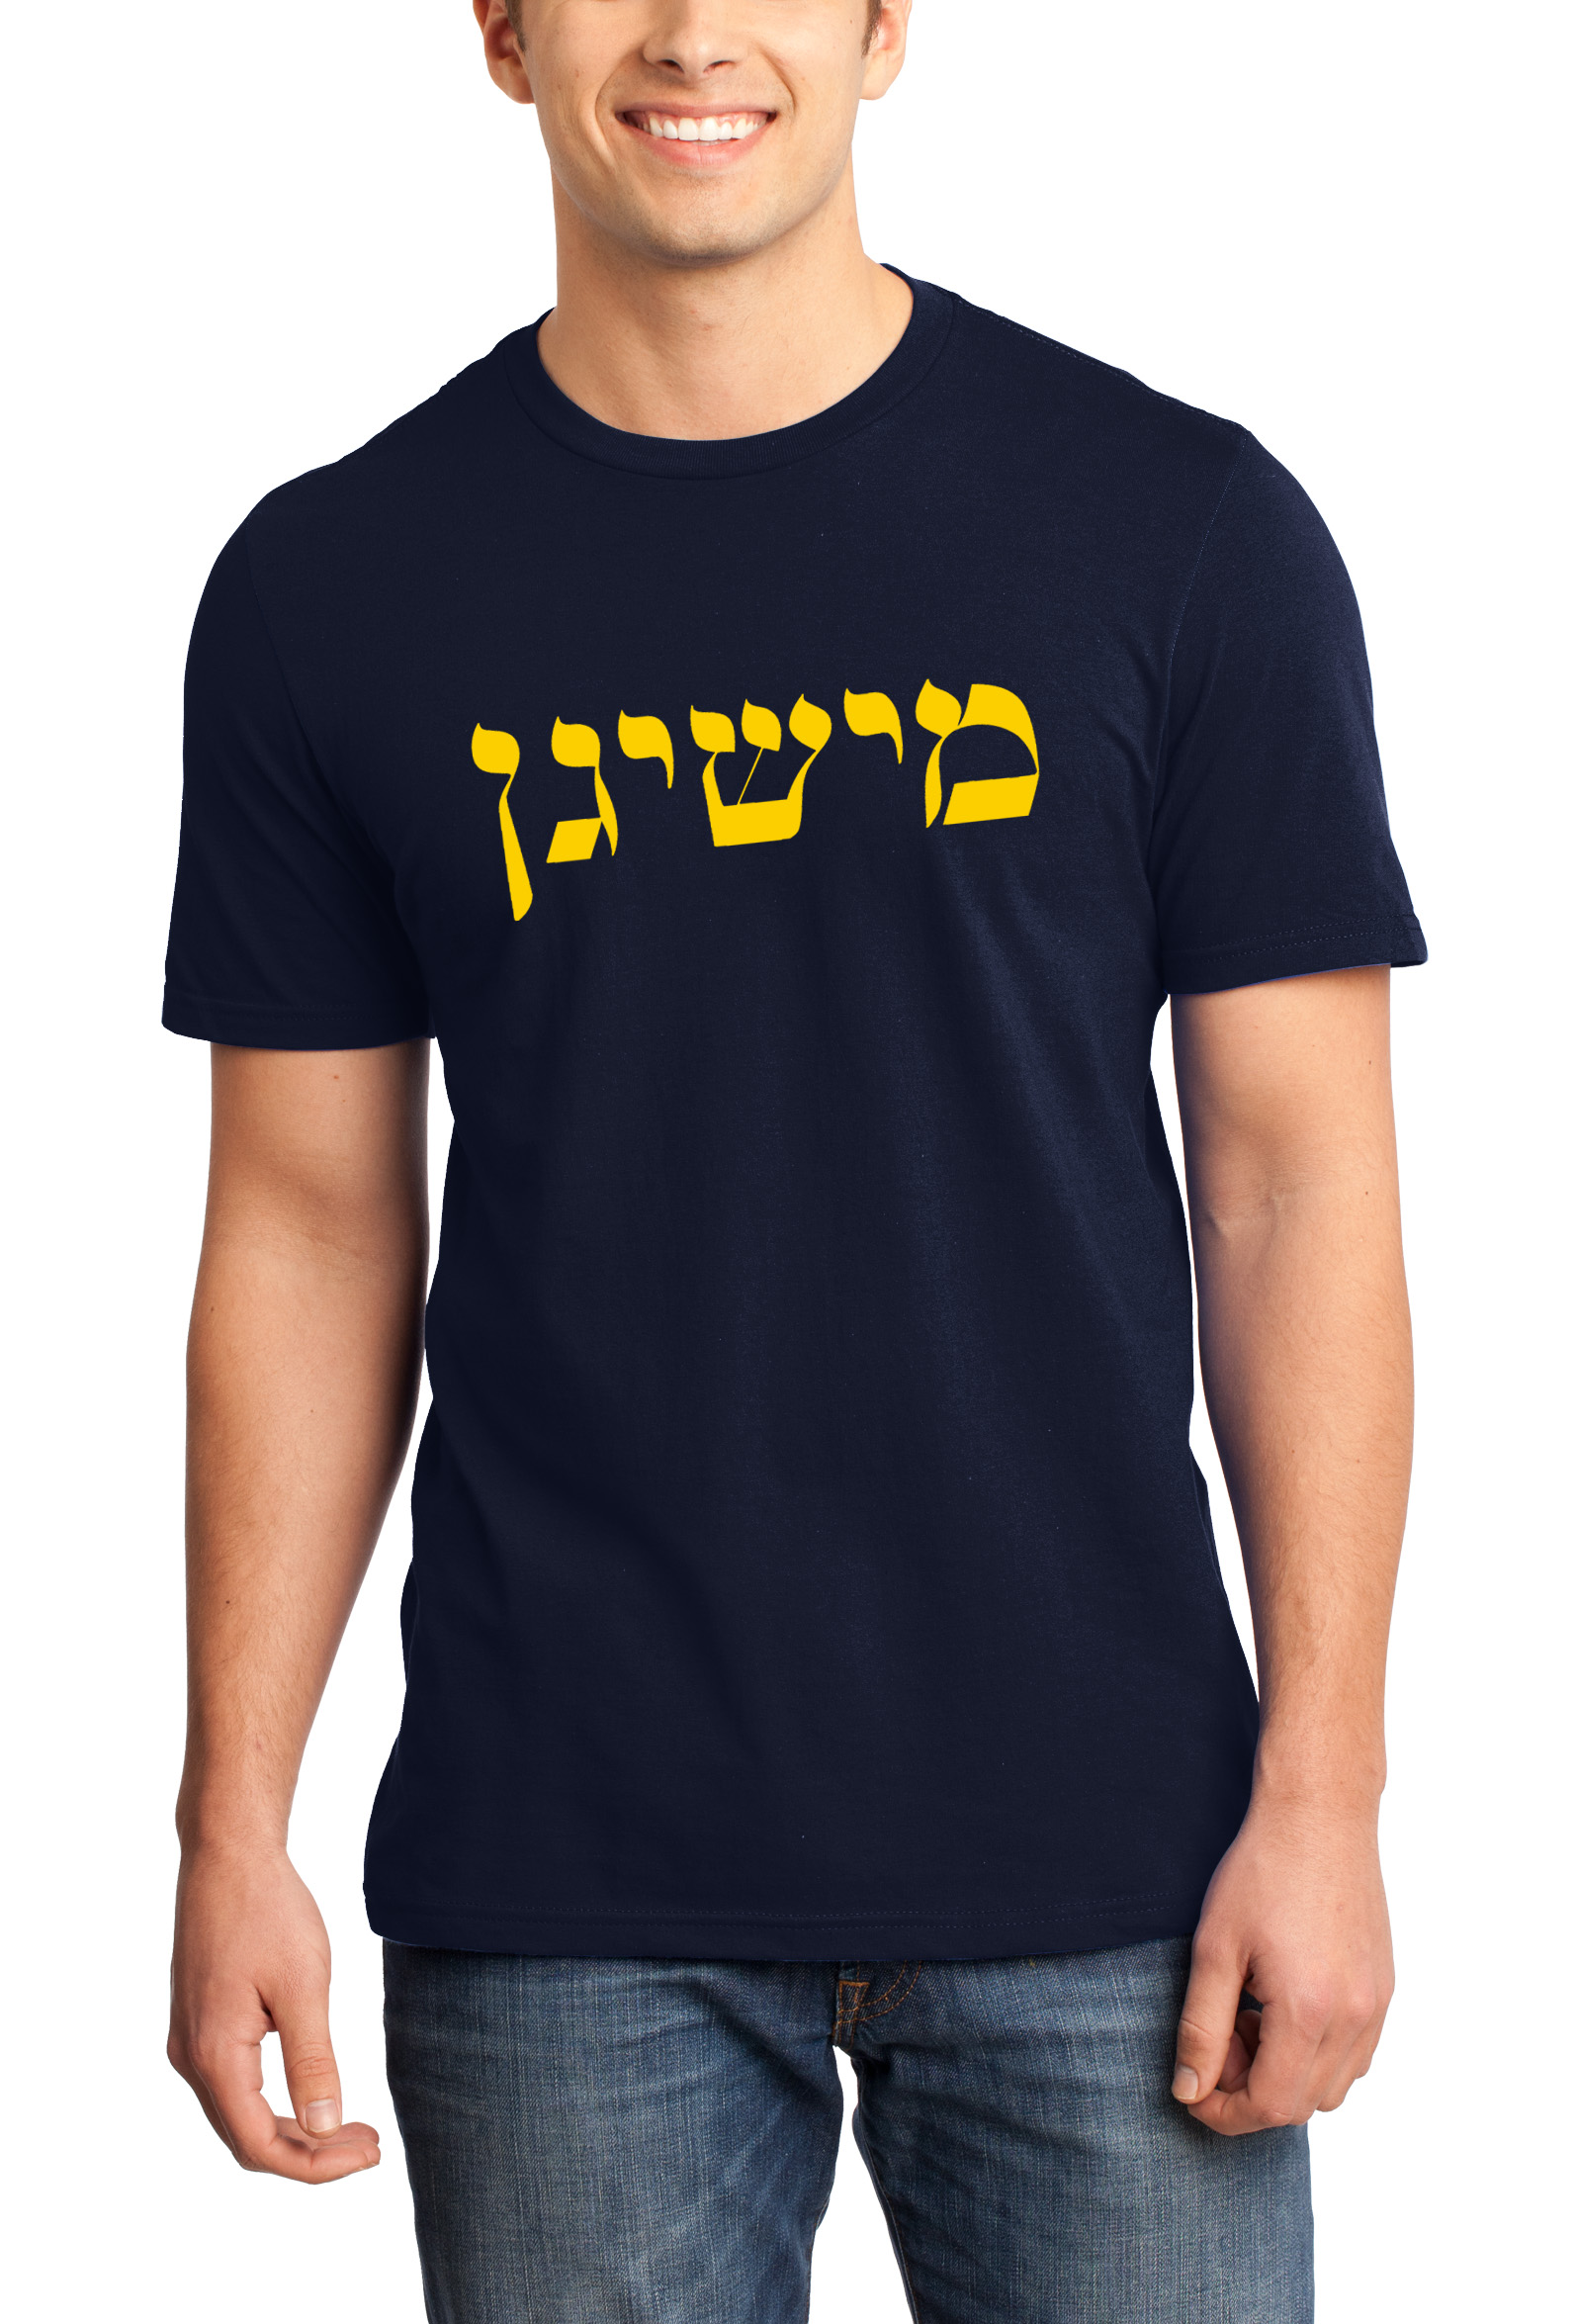 Mich Hebrew Tee.jpg